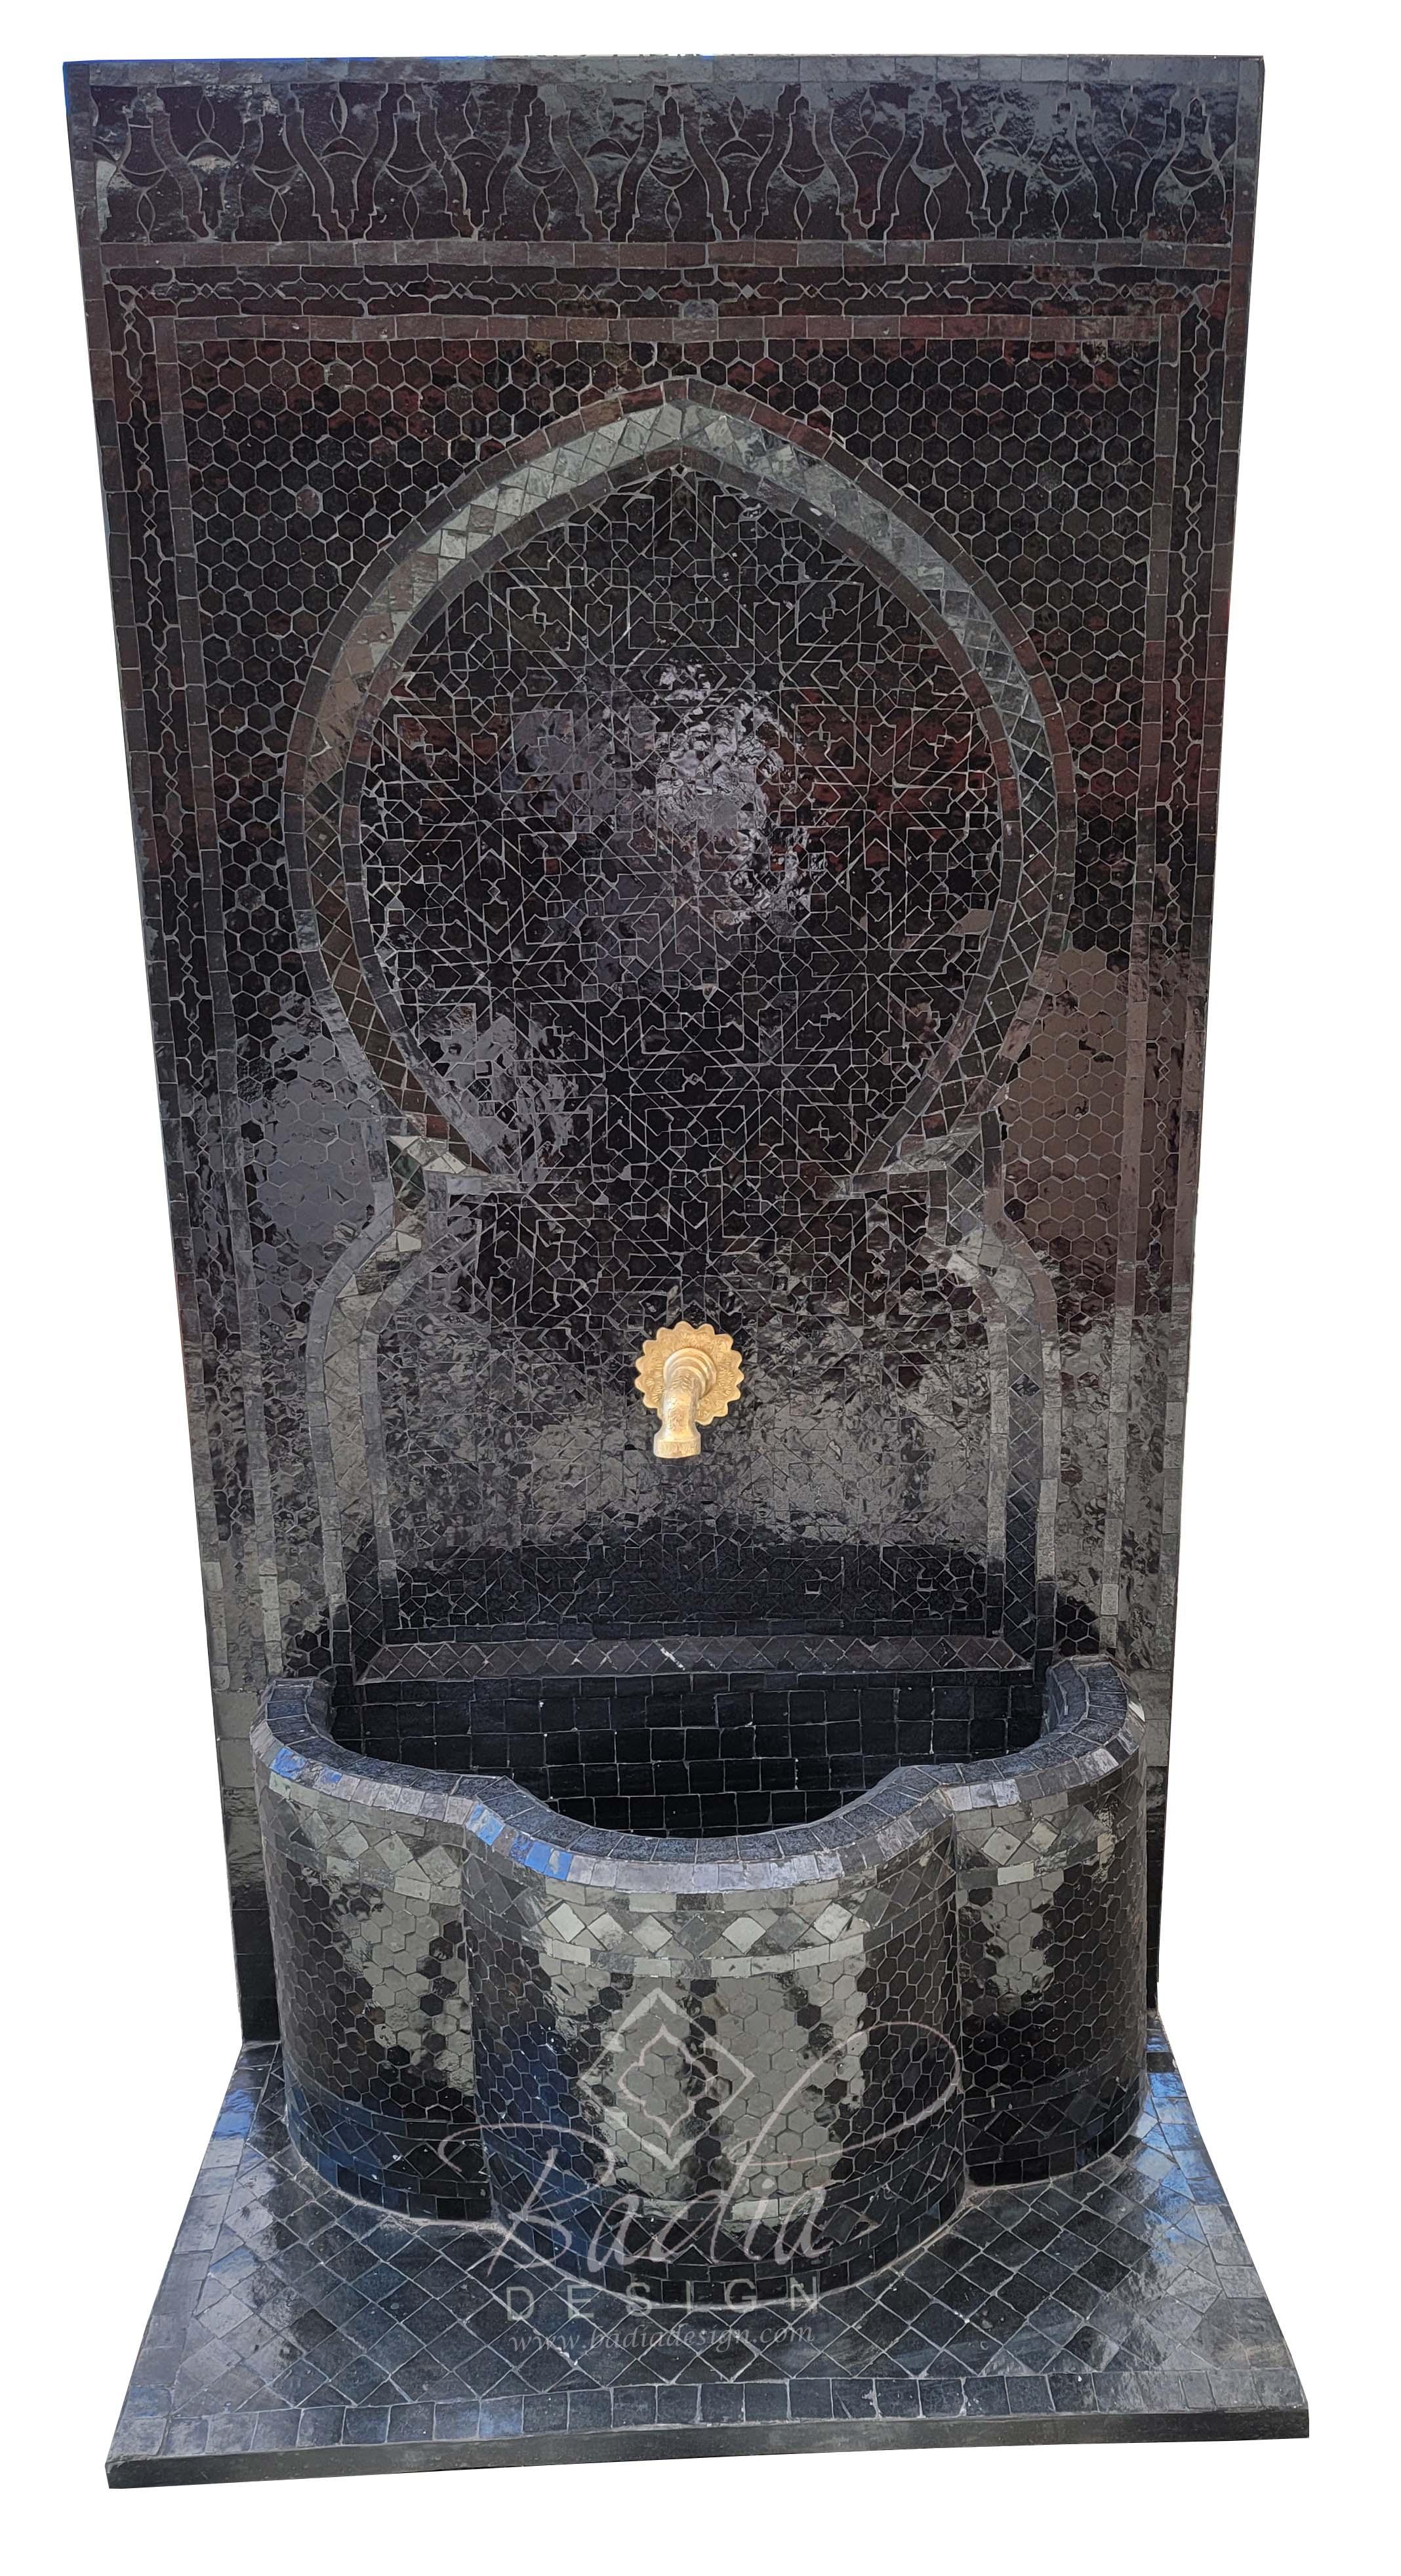 moroccan-large-black-mosaic-tile-water-fountain-mf700.jpg